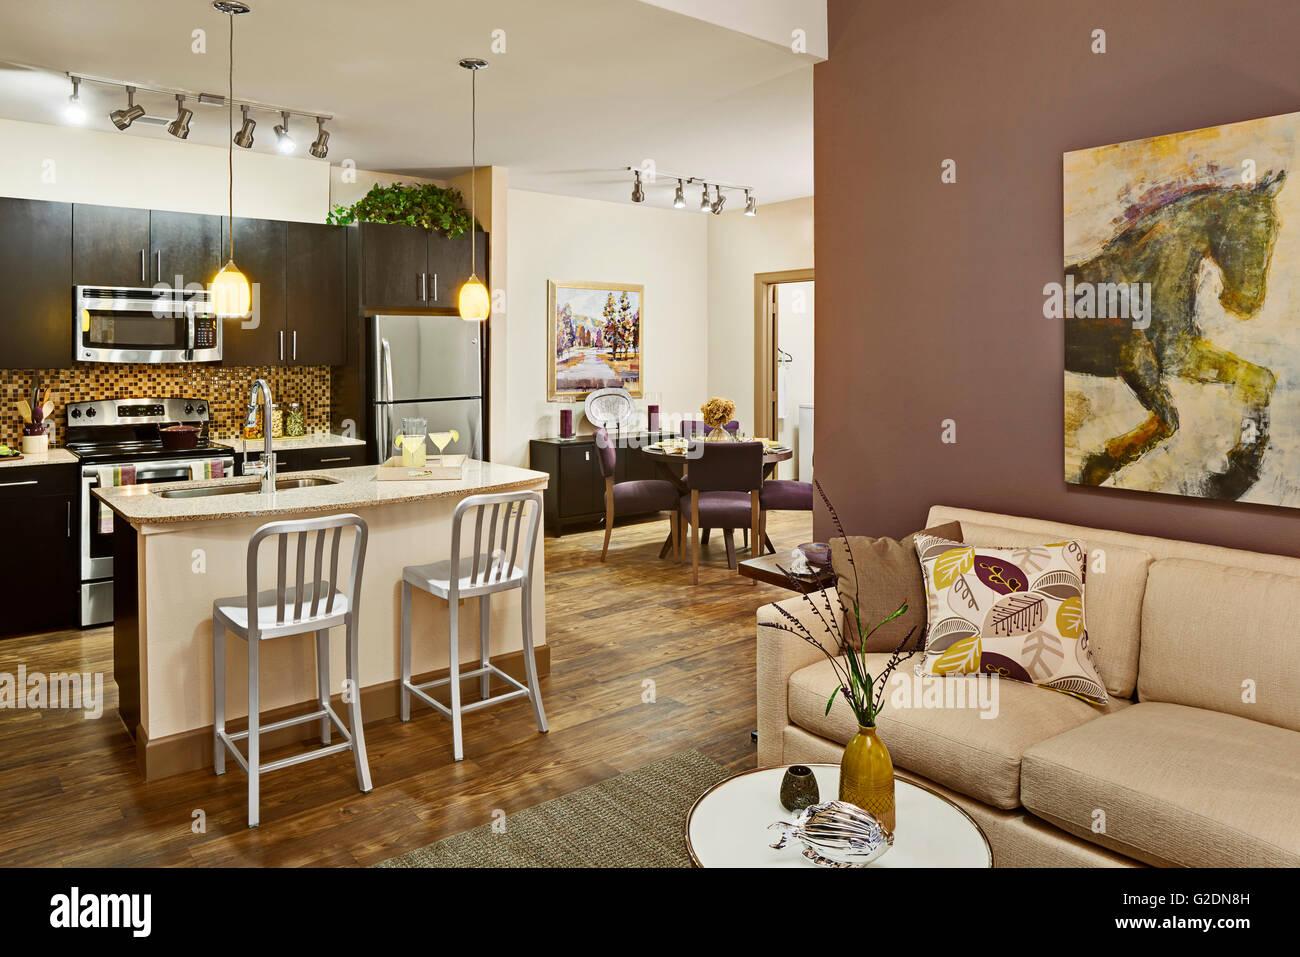 Apartment With Open Floor Plan Stock Photo Alamy